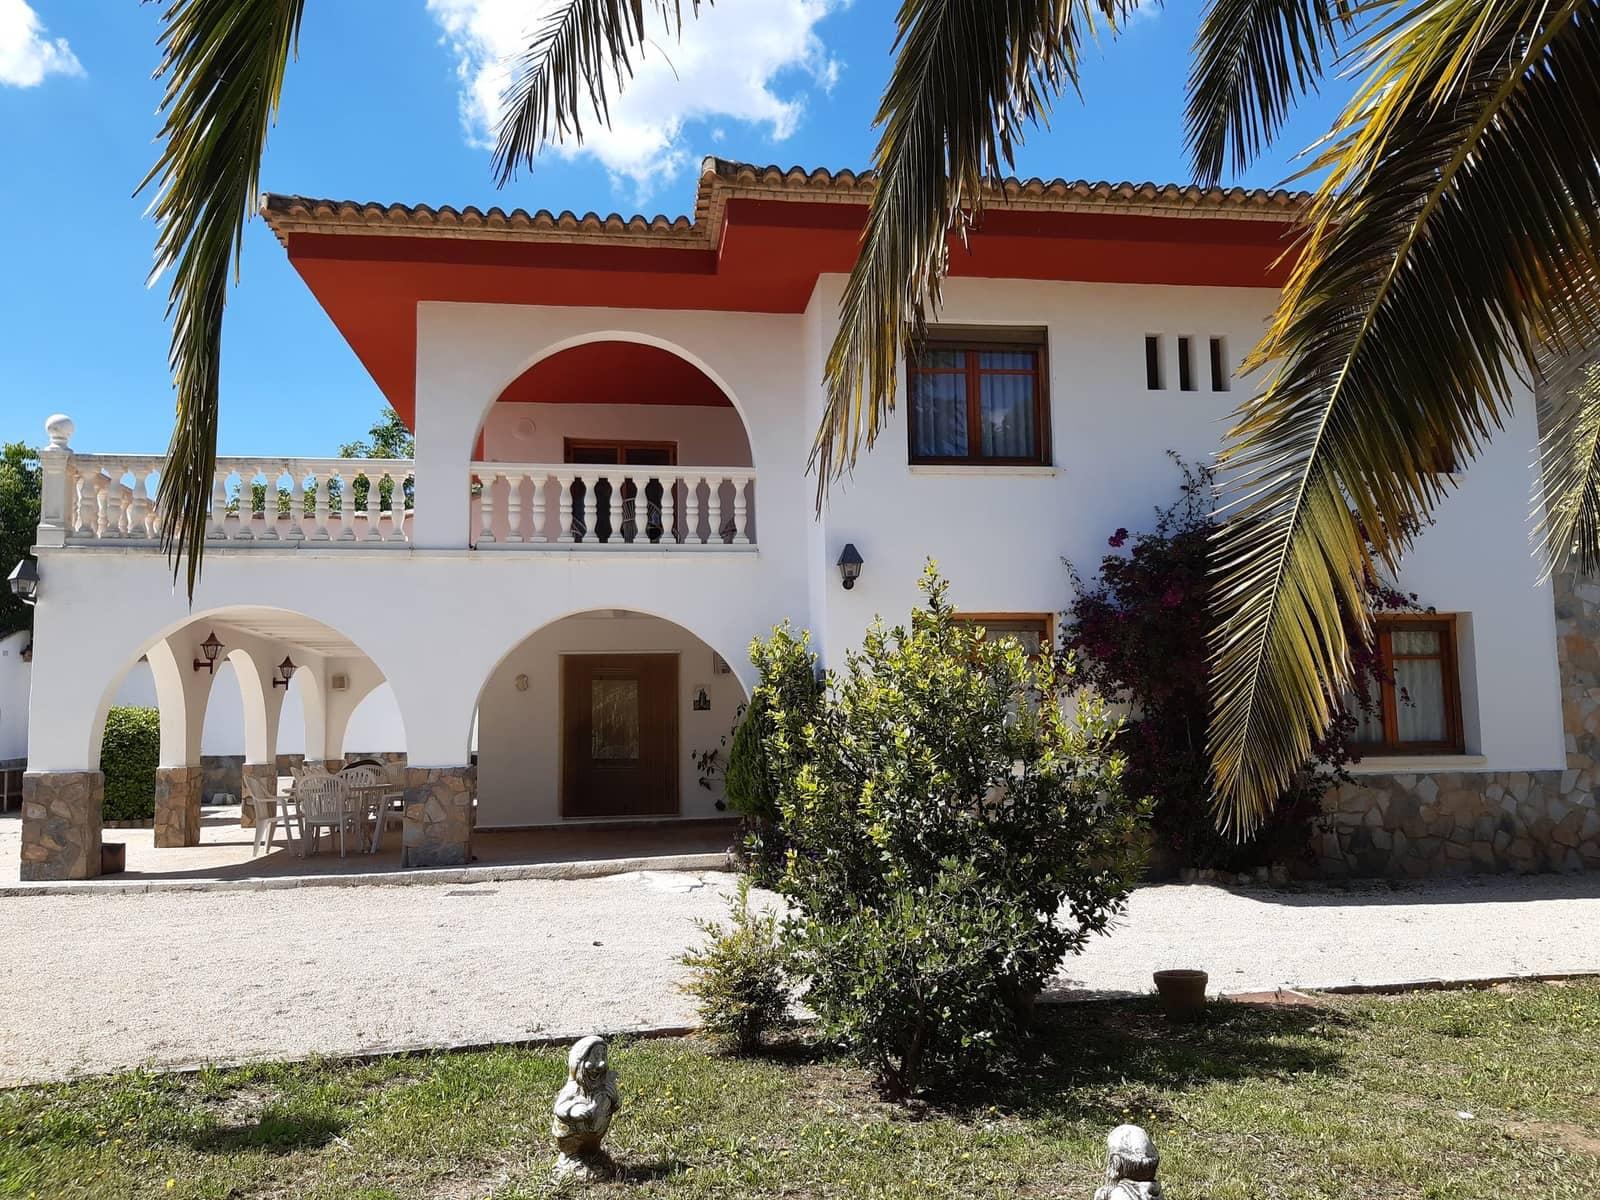 4 bedroom Villa for sale in Ontinyent - € 190,000 (Ref: 5325061)